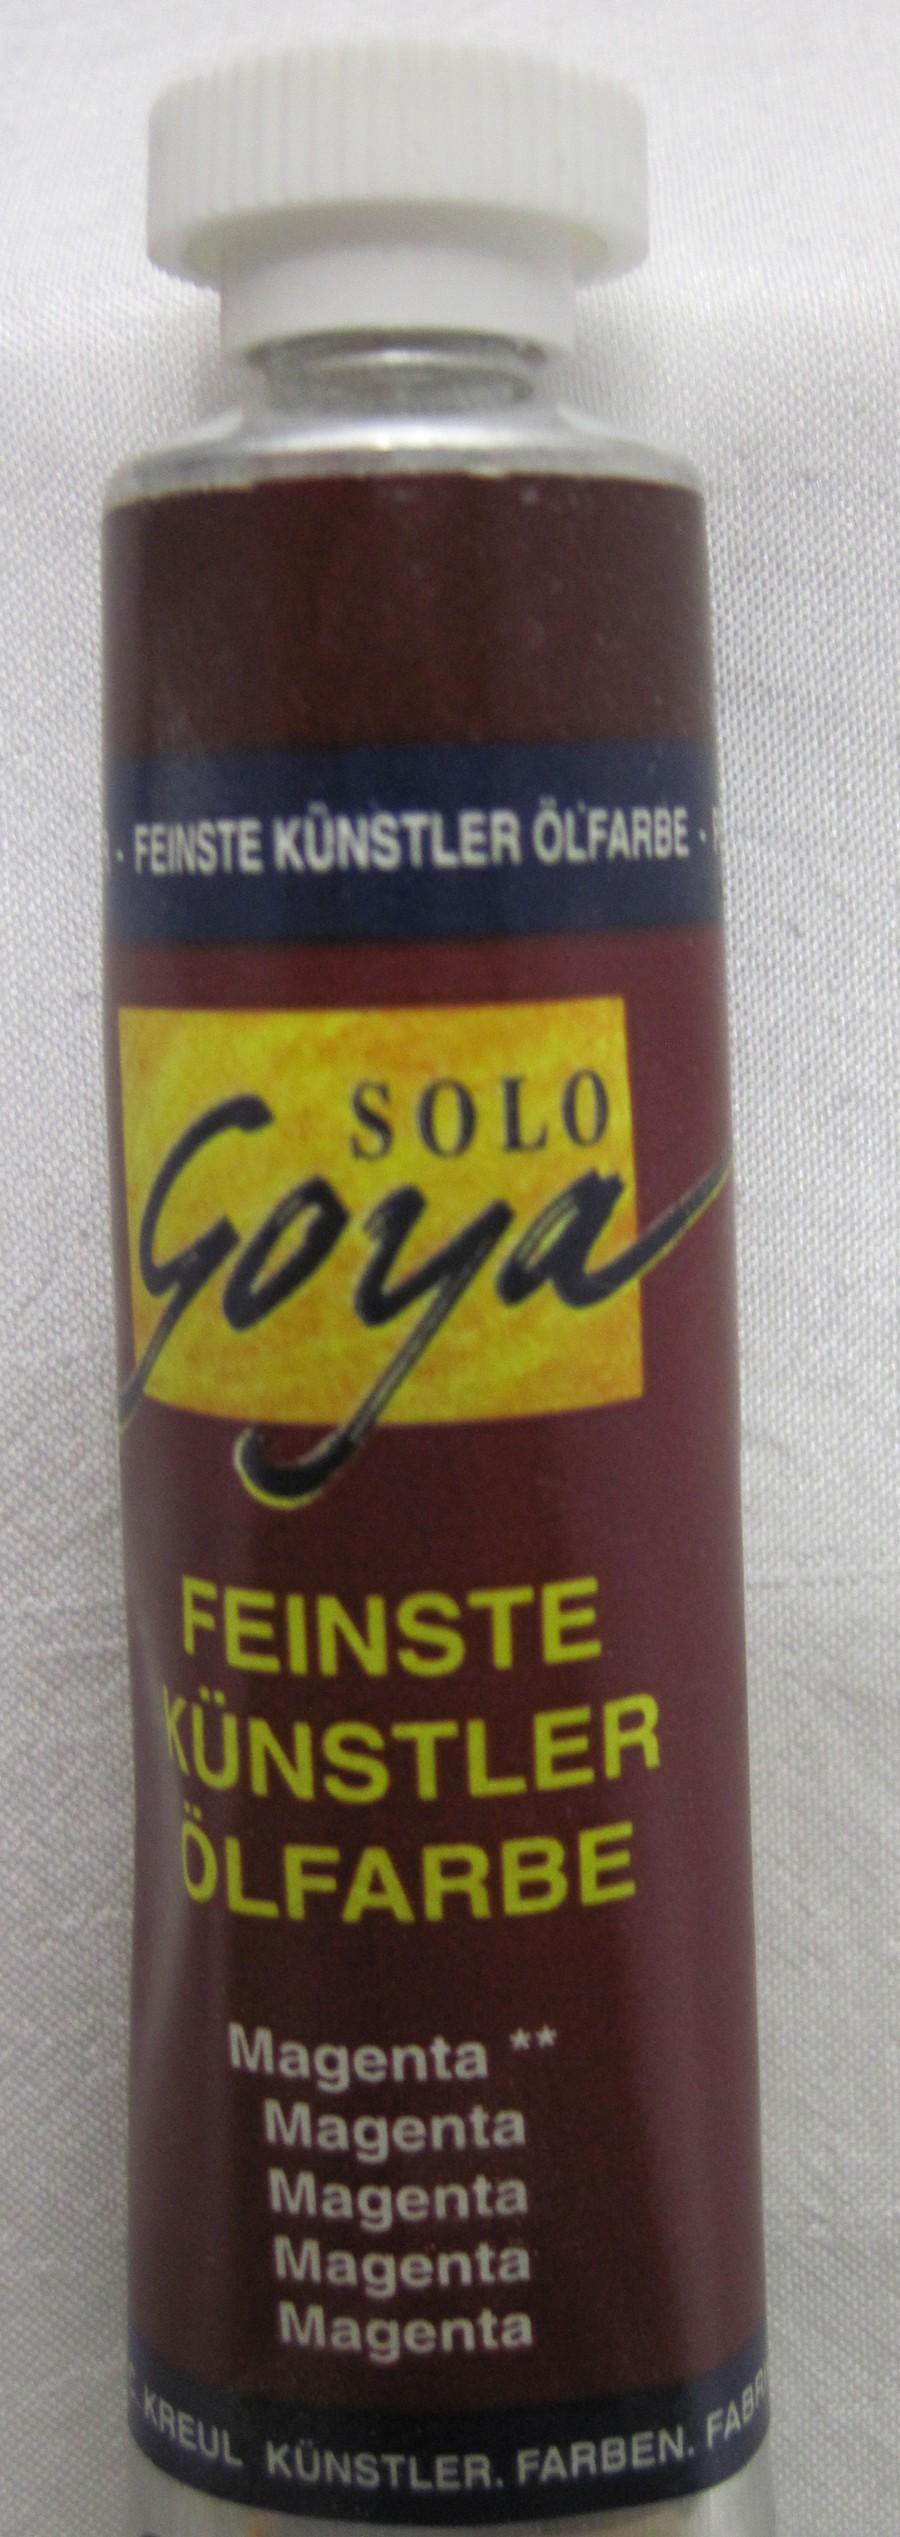 Feinste Künstlerölfarbe Goya magenta 20 ml